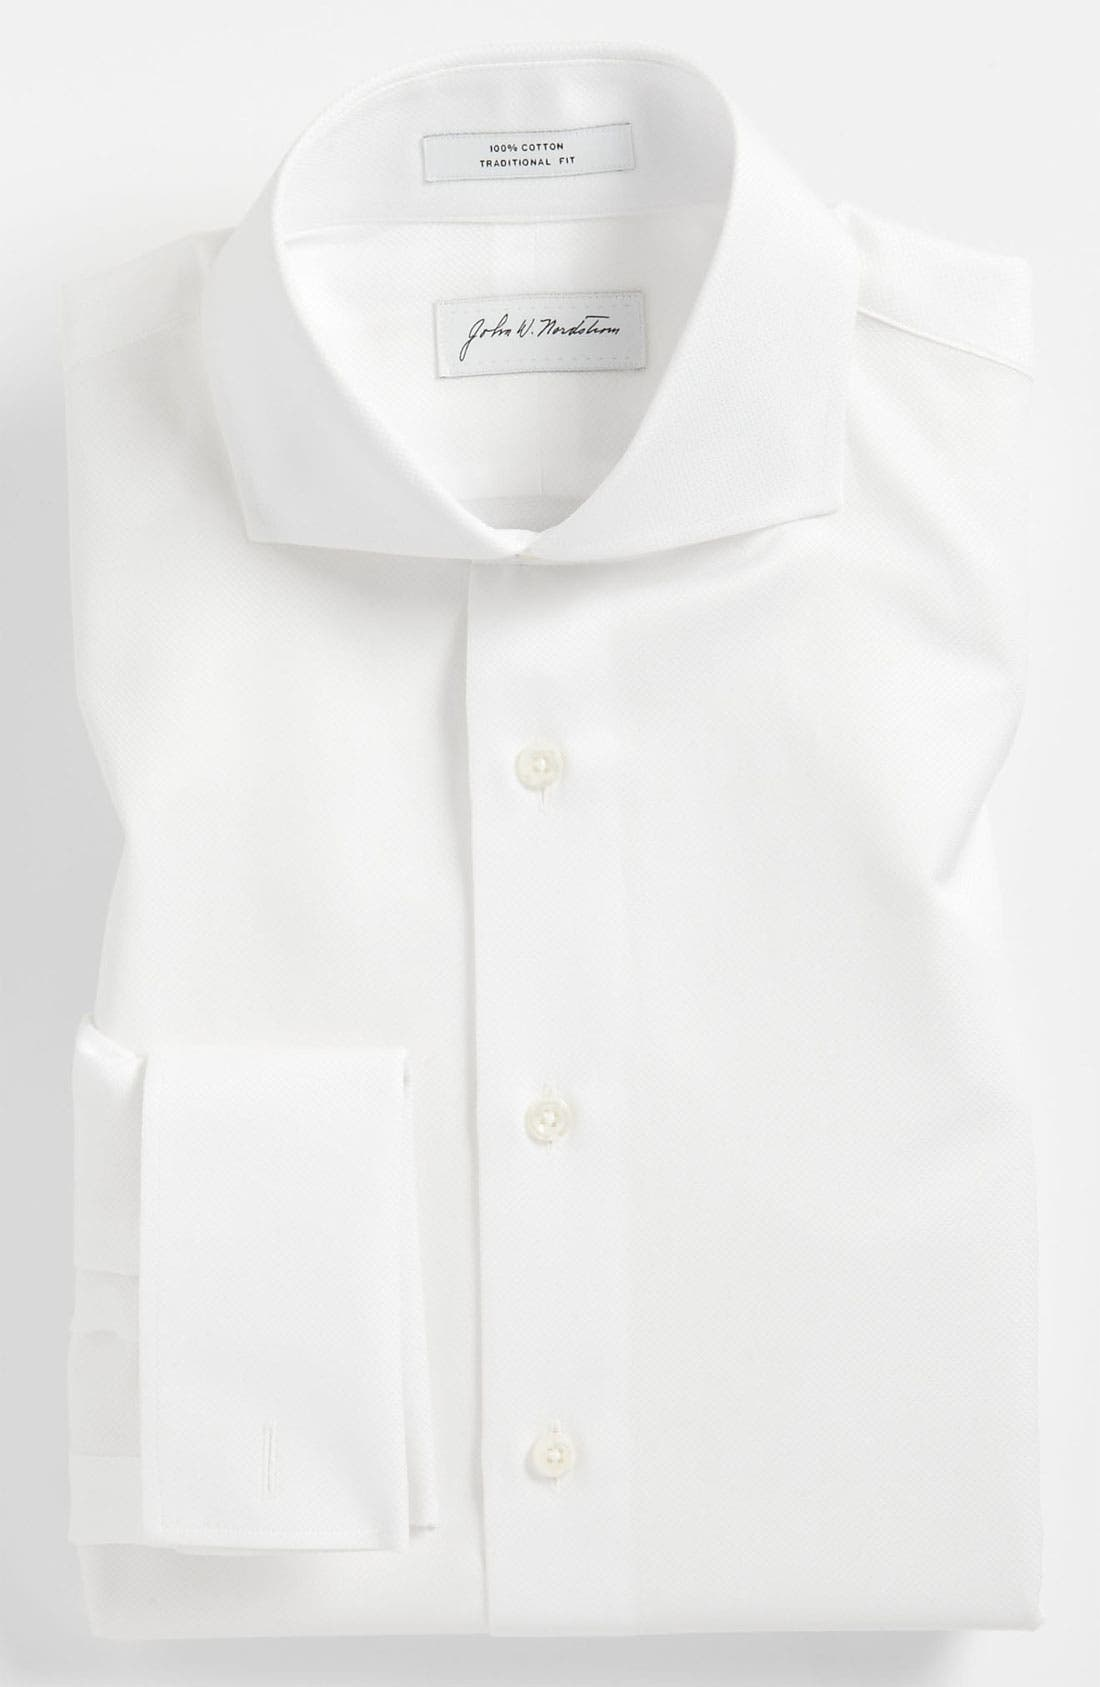 Alternate Image 1 Selected - John W. Nordstrom® Traditional Fit Tuxedo Shirt